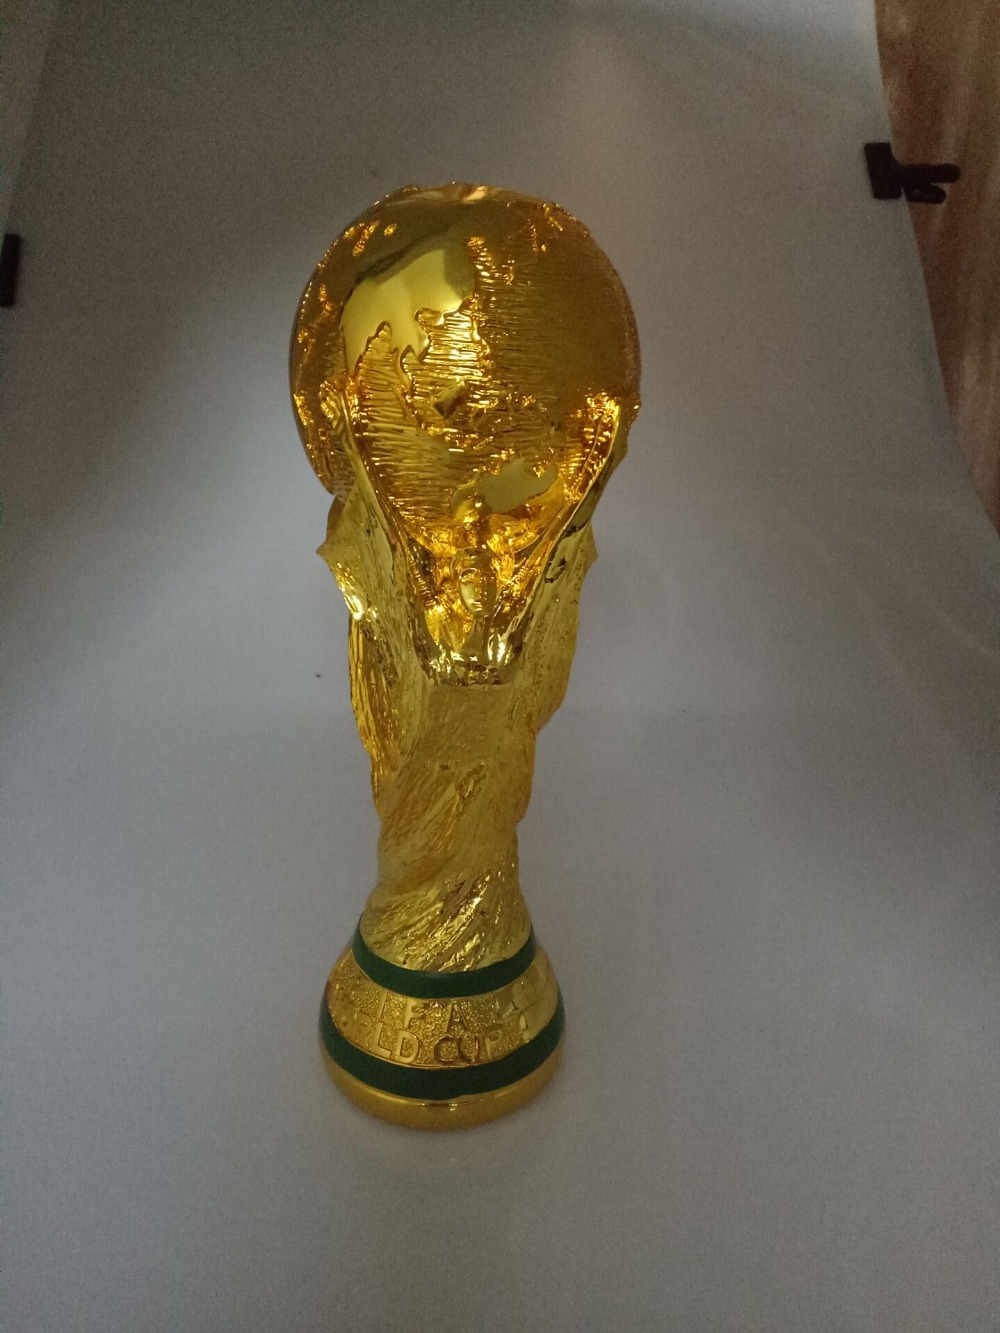 1:1.3 27cm <font><b>World</b></font> <font><b>Cup</b></font> <font><b>Football</b></font> trophy Resin Replica Trophies Model <font><b>Brazil</b></font> <font><b>World</b></font> <font><b>Cup</b></font> Best Soccer Fan Souvenir Gift Free Shipping